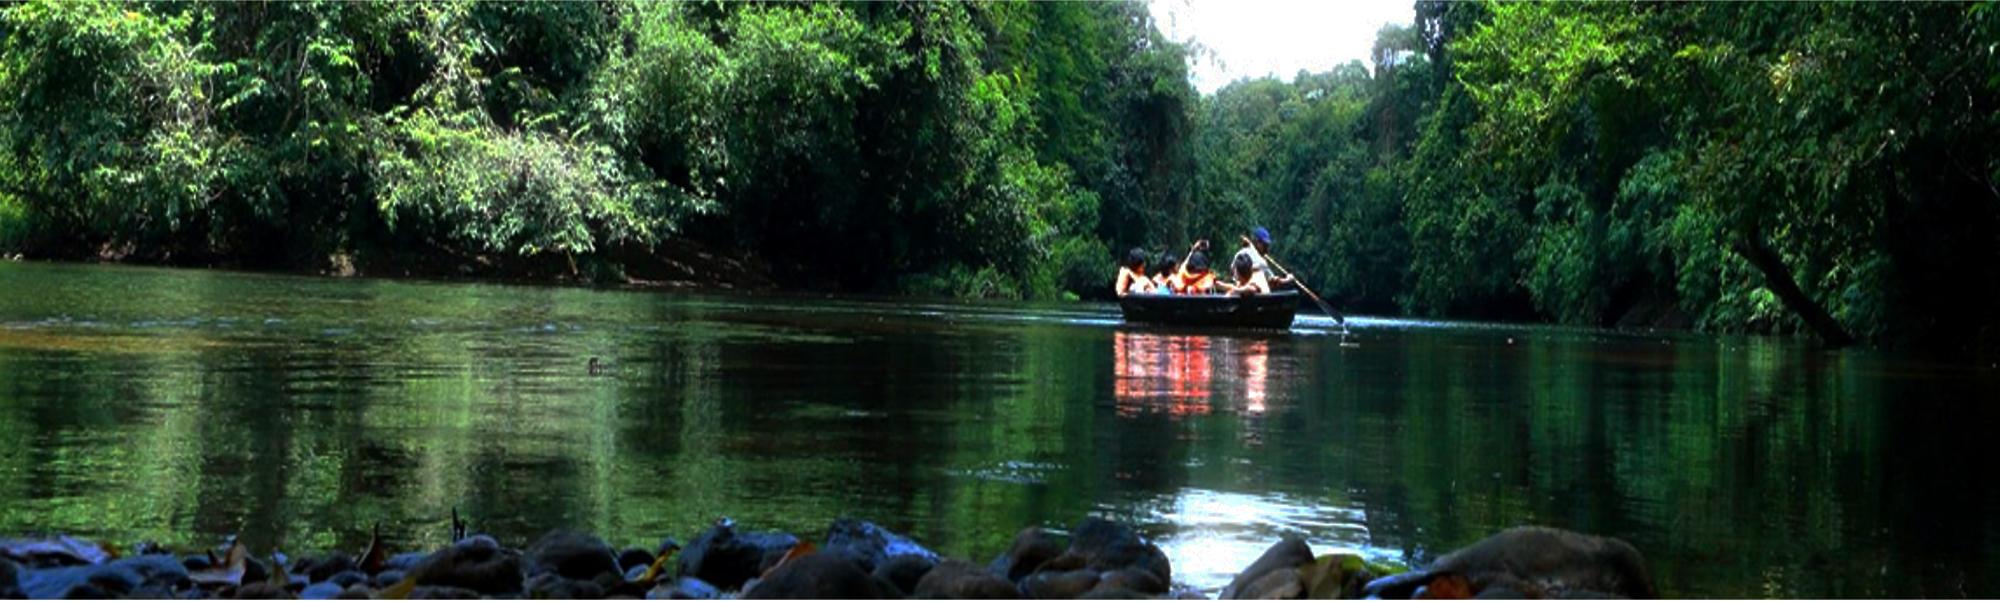 Adavi Boating